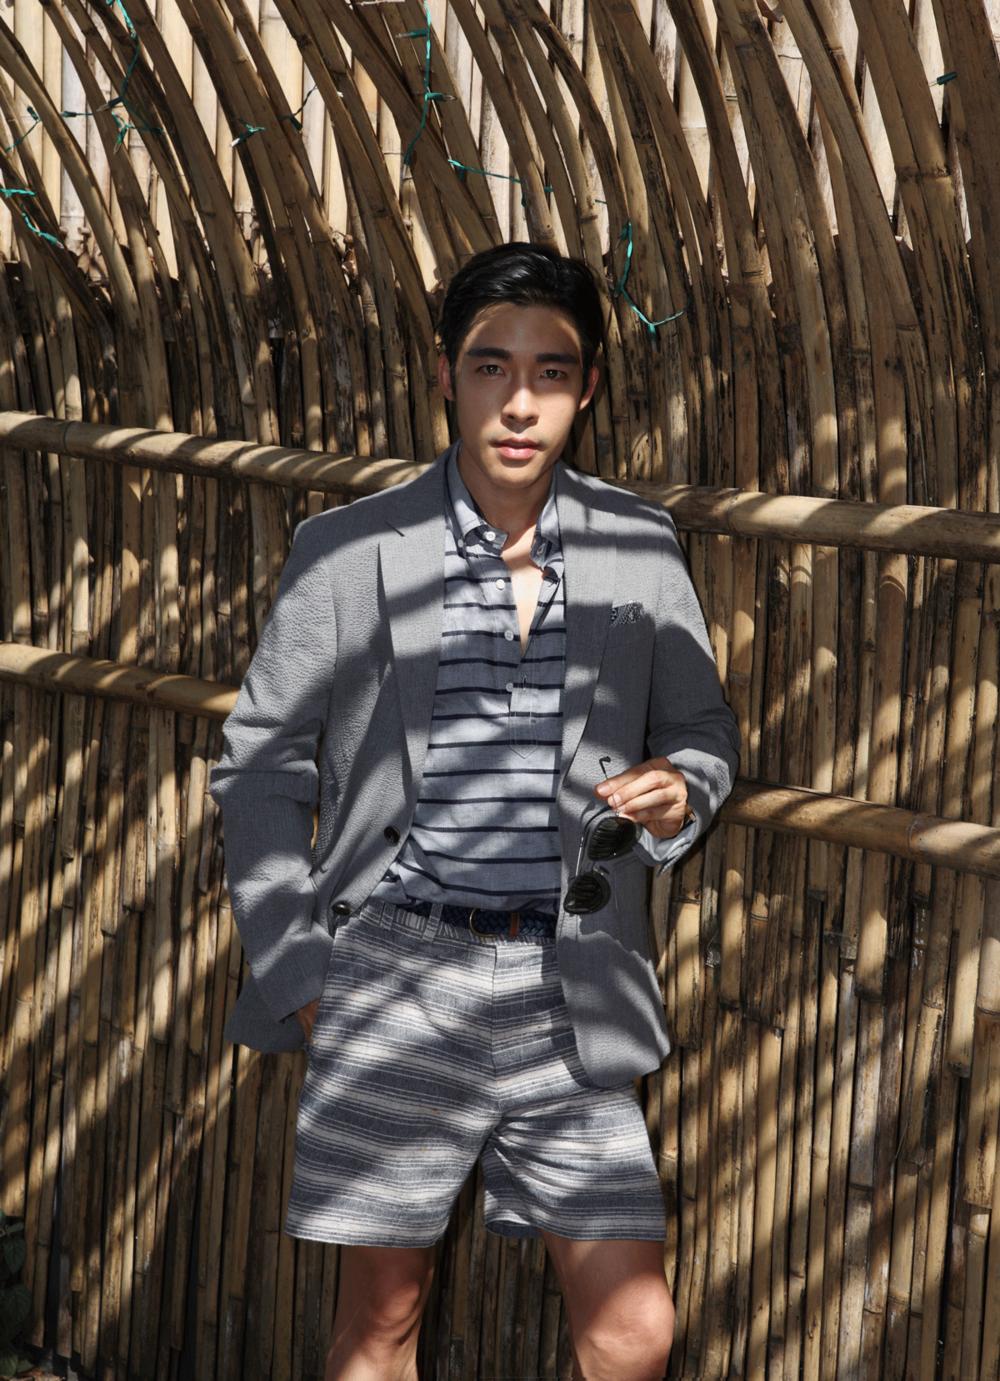 clothes : JBB* / sunglasses : GLAZZIQ